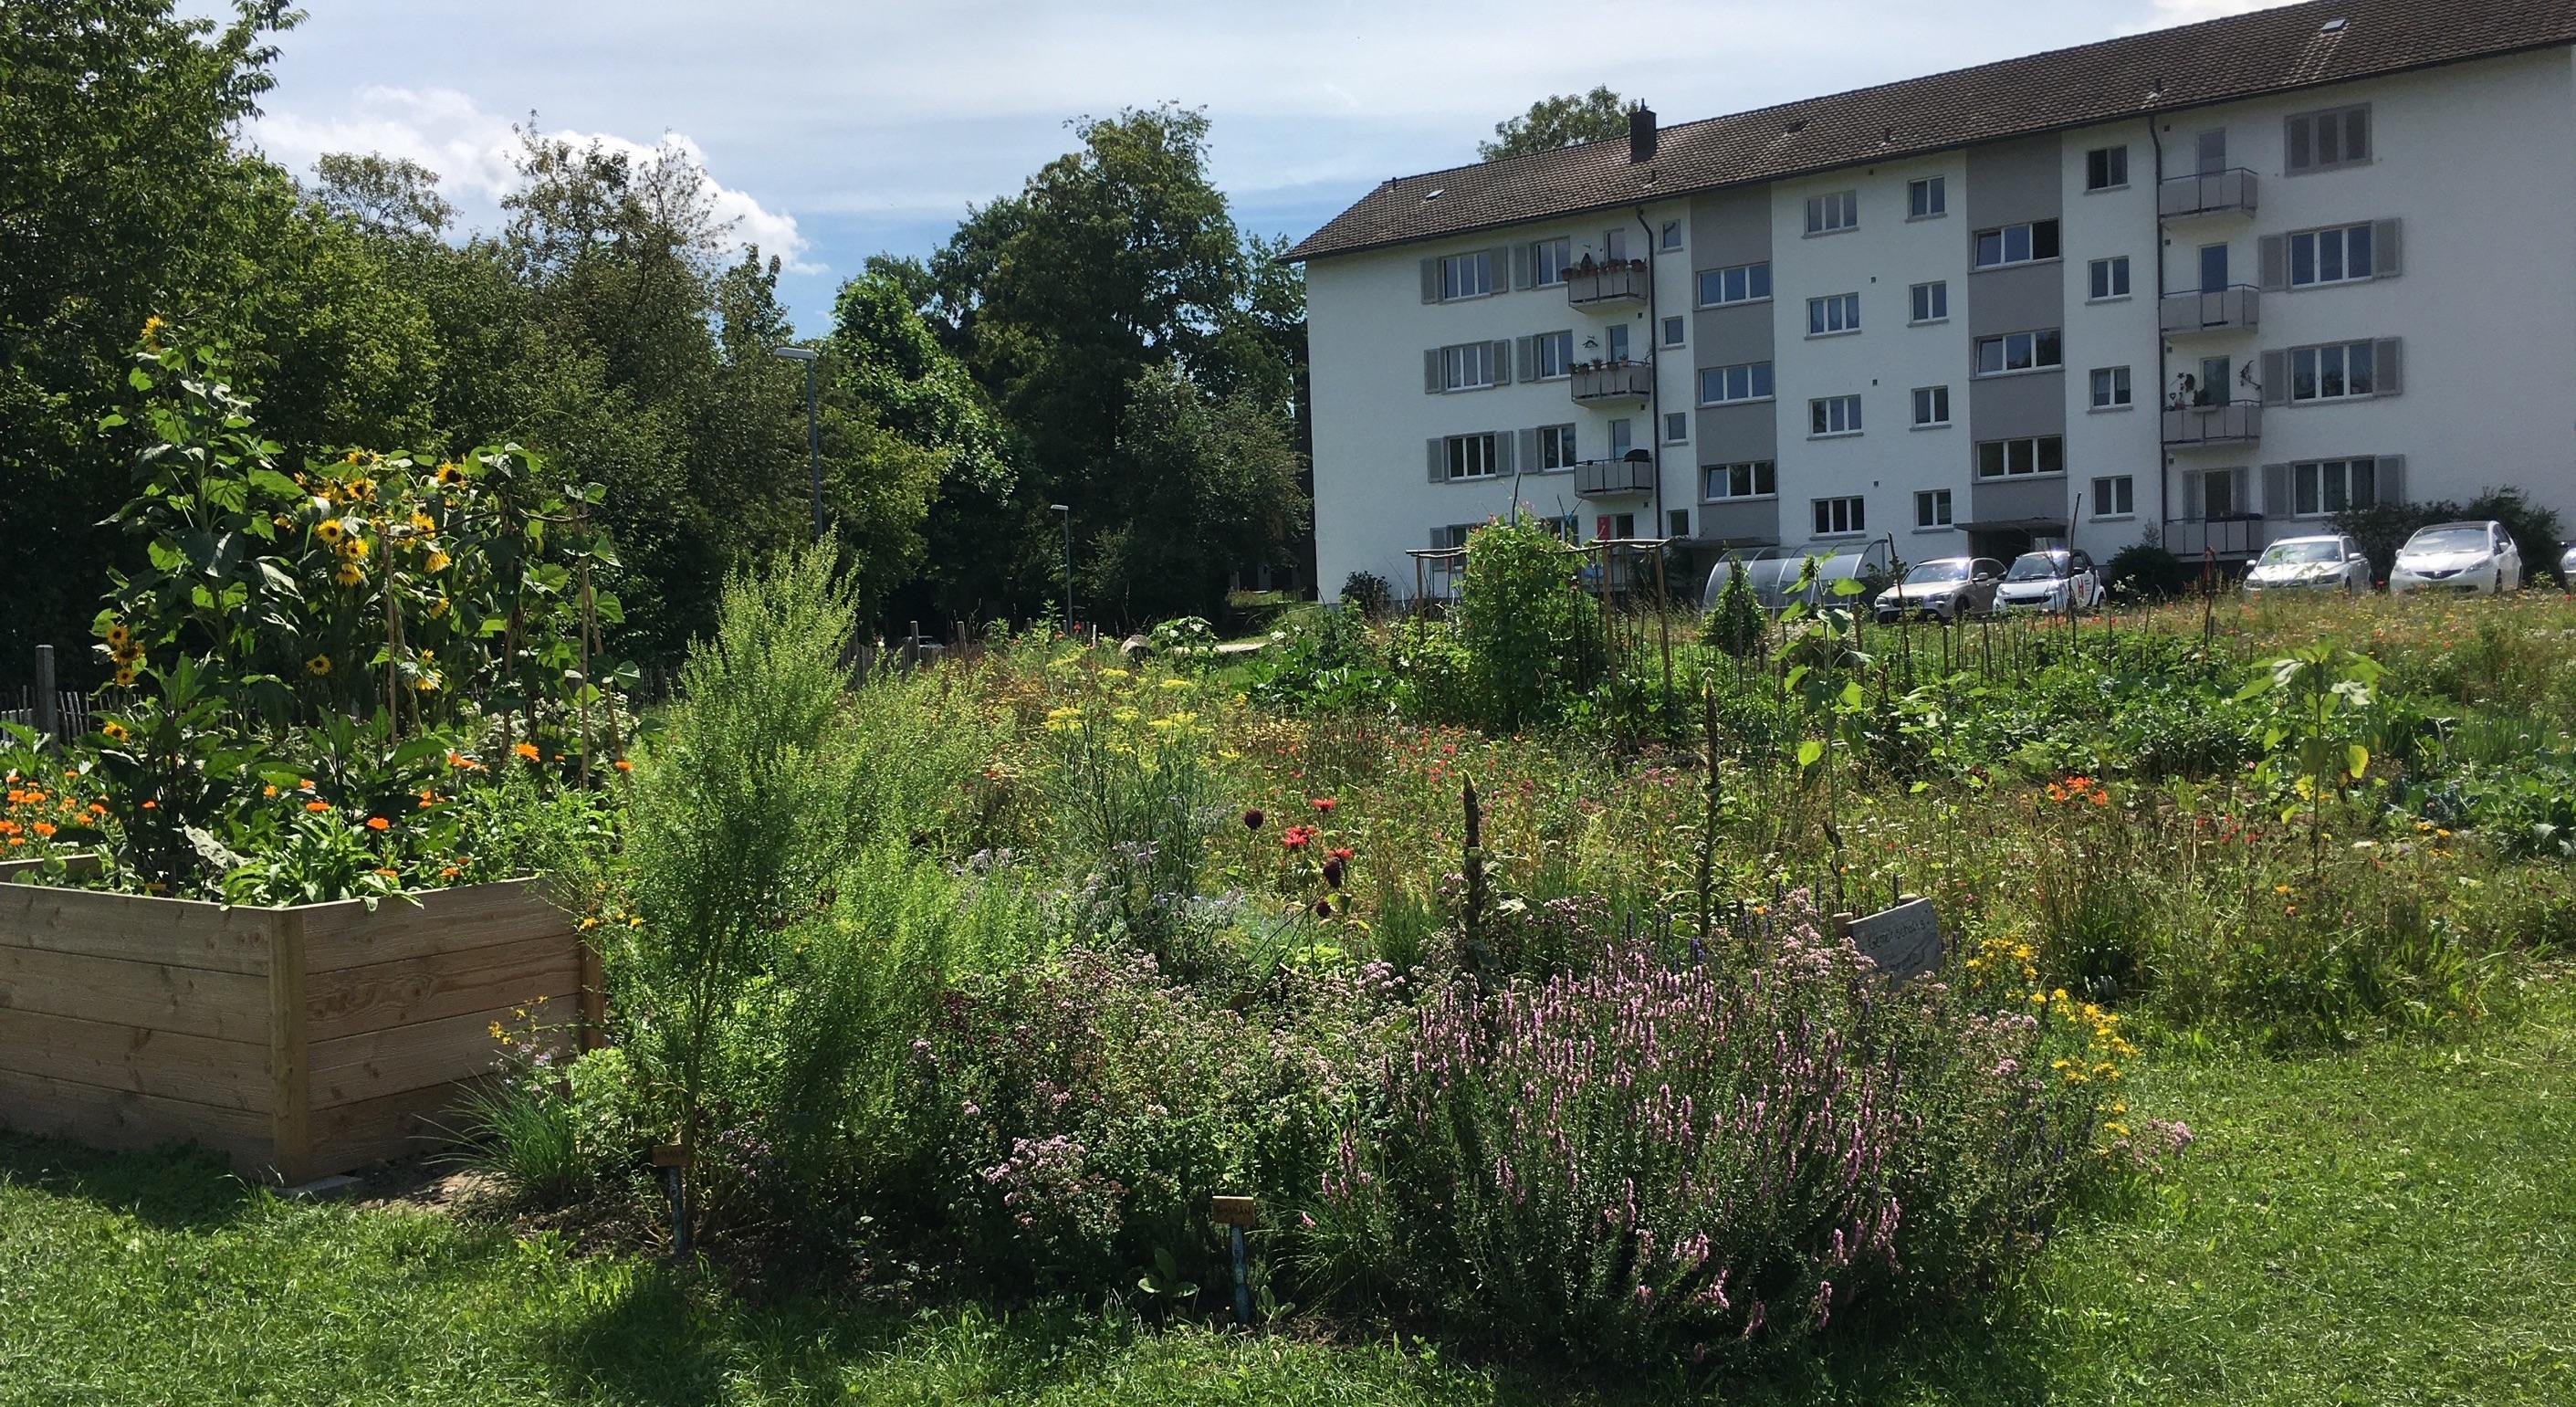 2020-07-19 Ogif Garten, 09